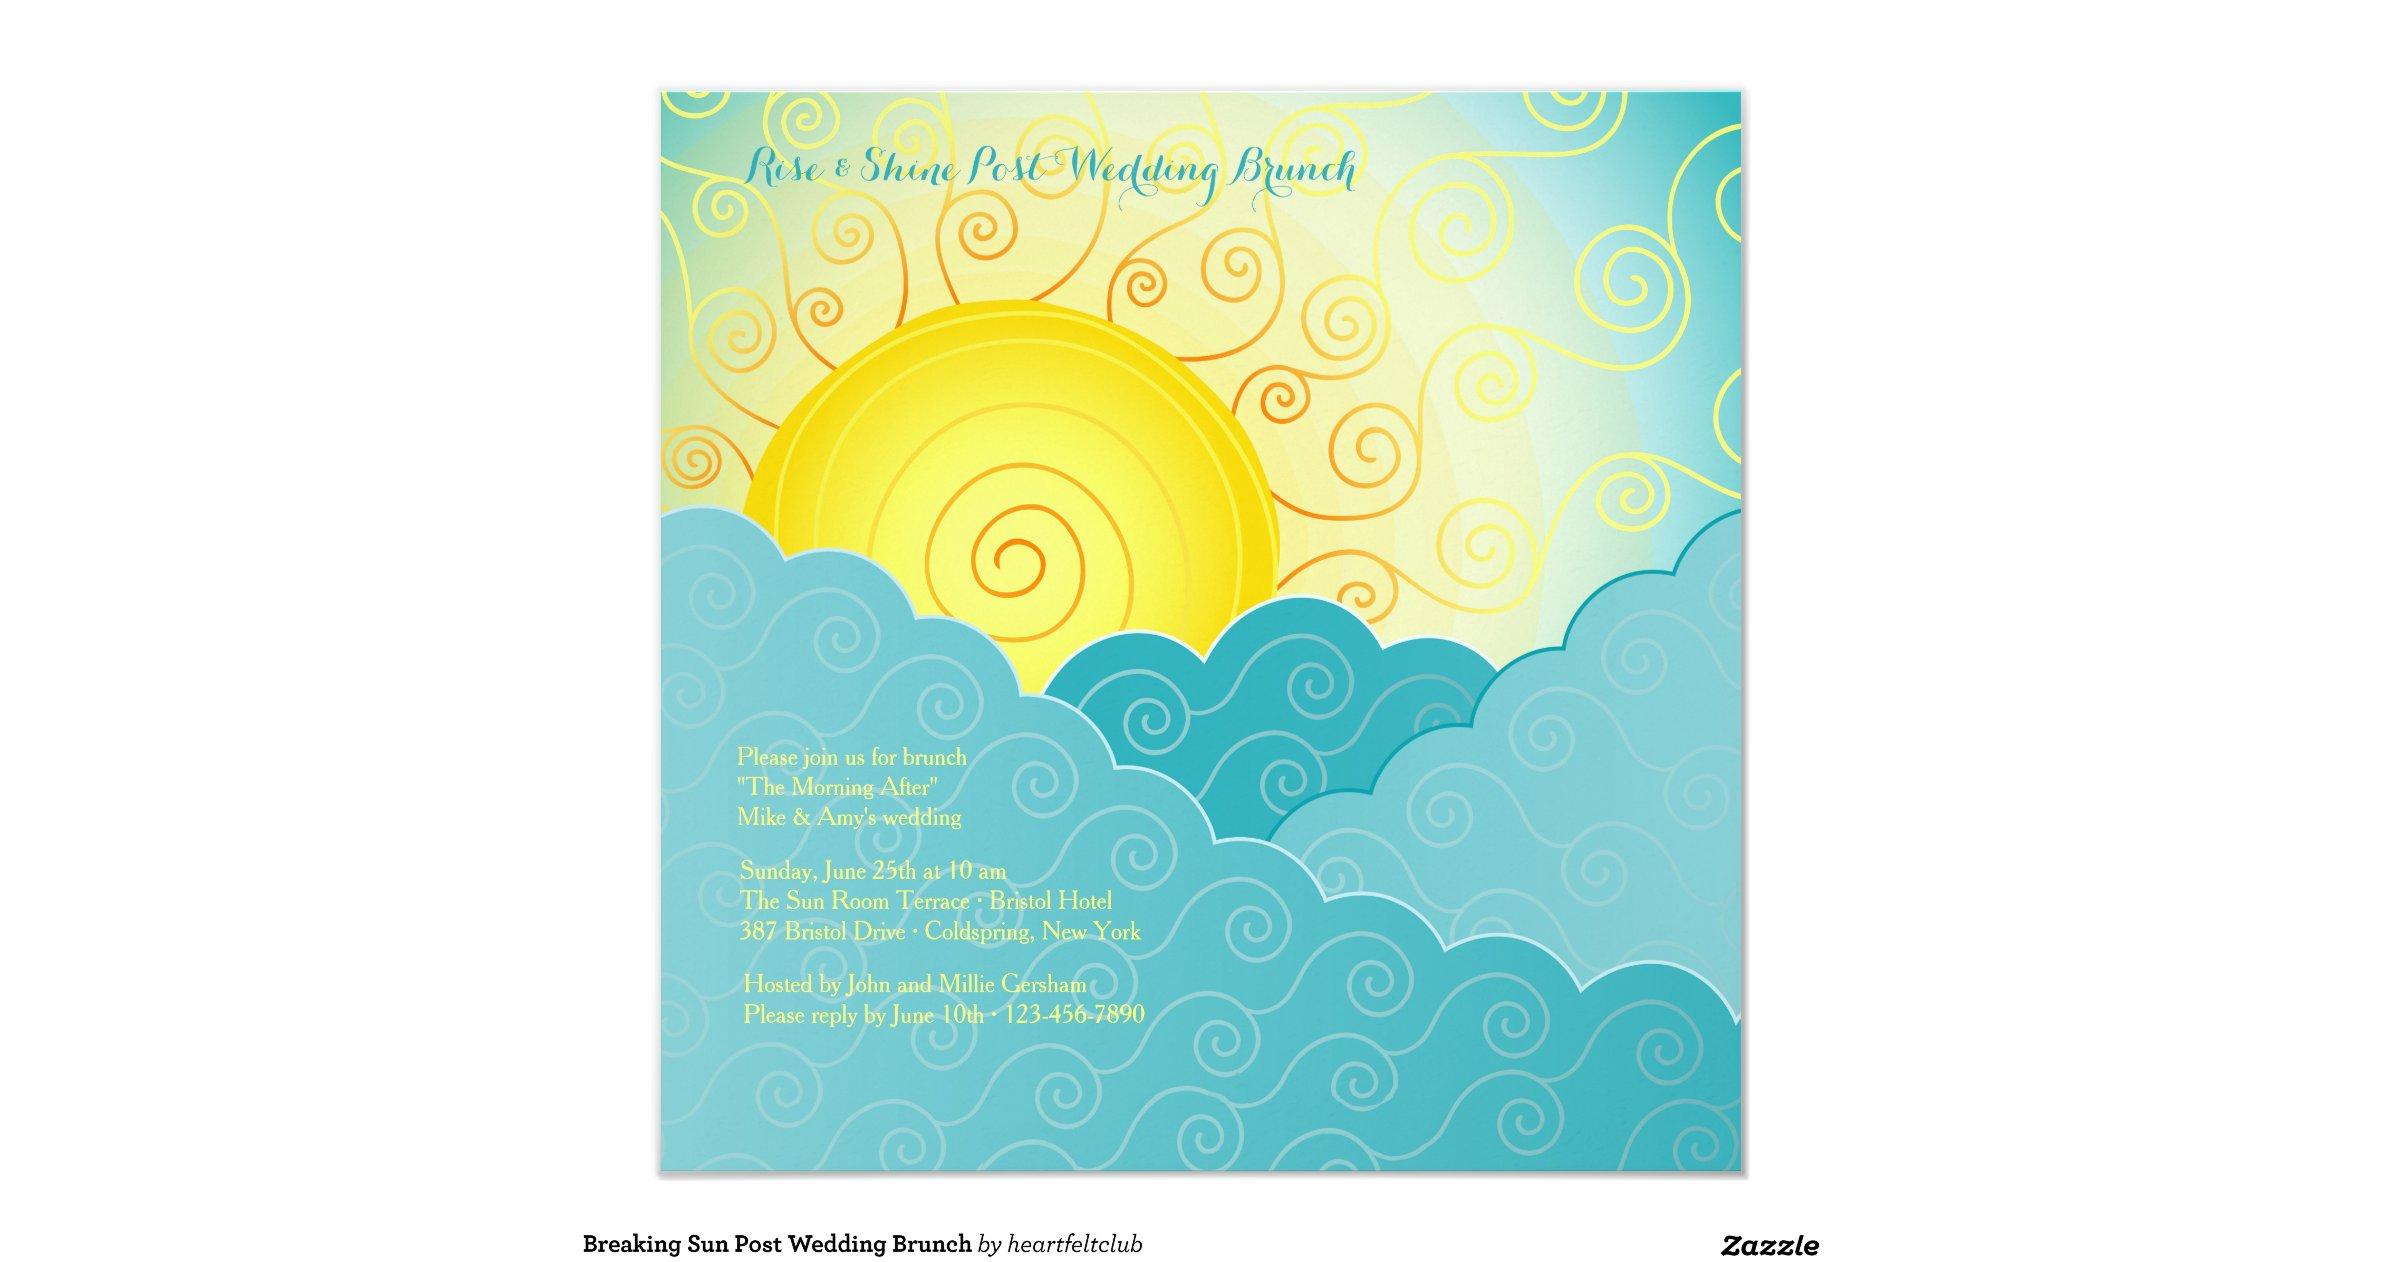 Breaking Sun Post Wedding Brunch Invitation Rf63856e6654044c38f3fd8b0340525f6 Zk9yv 1200